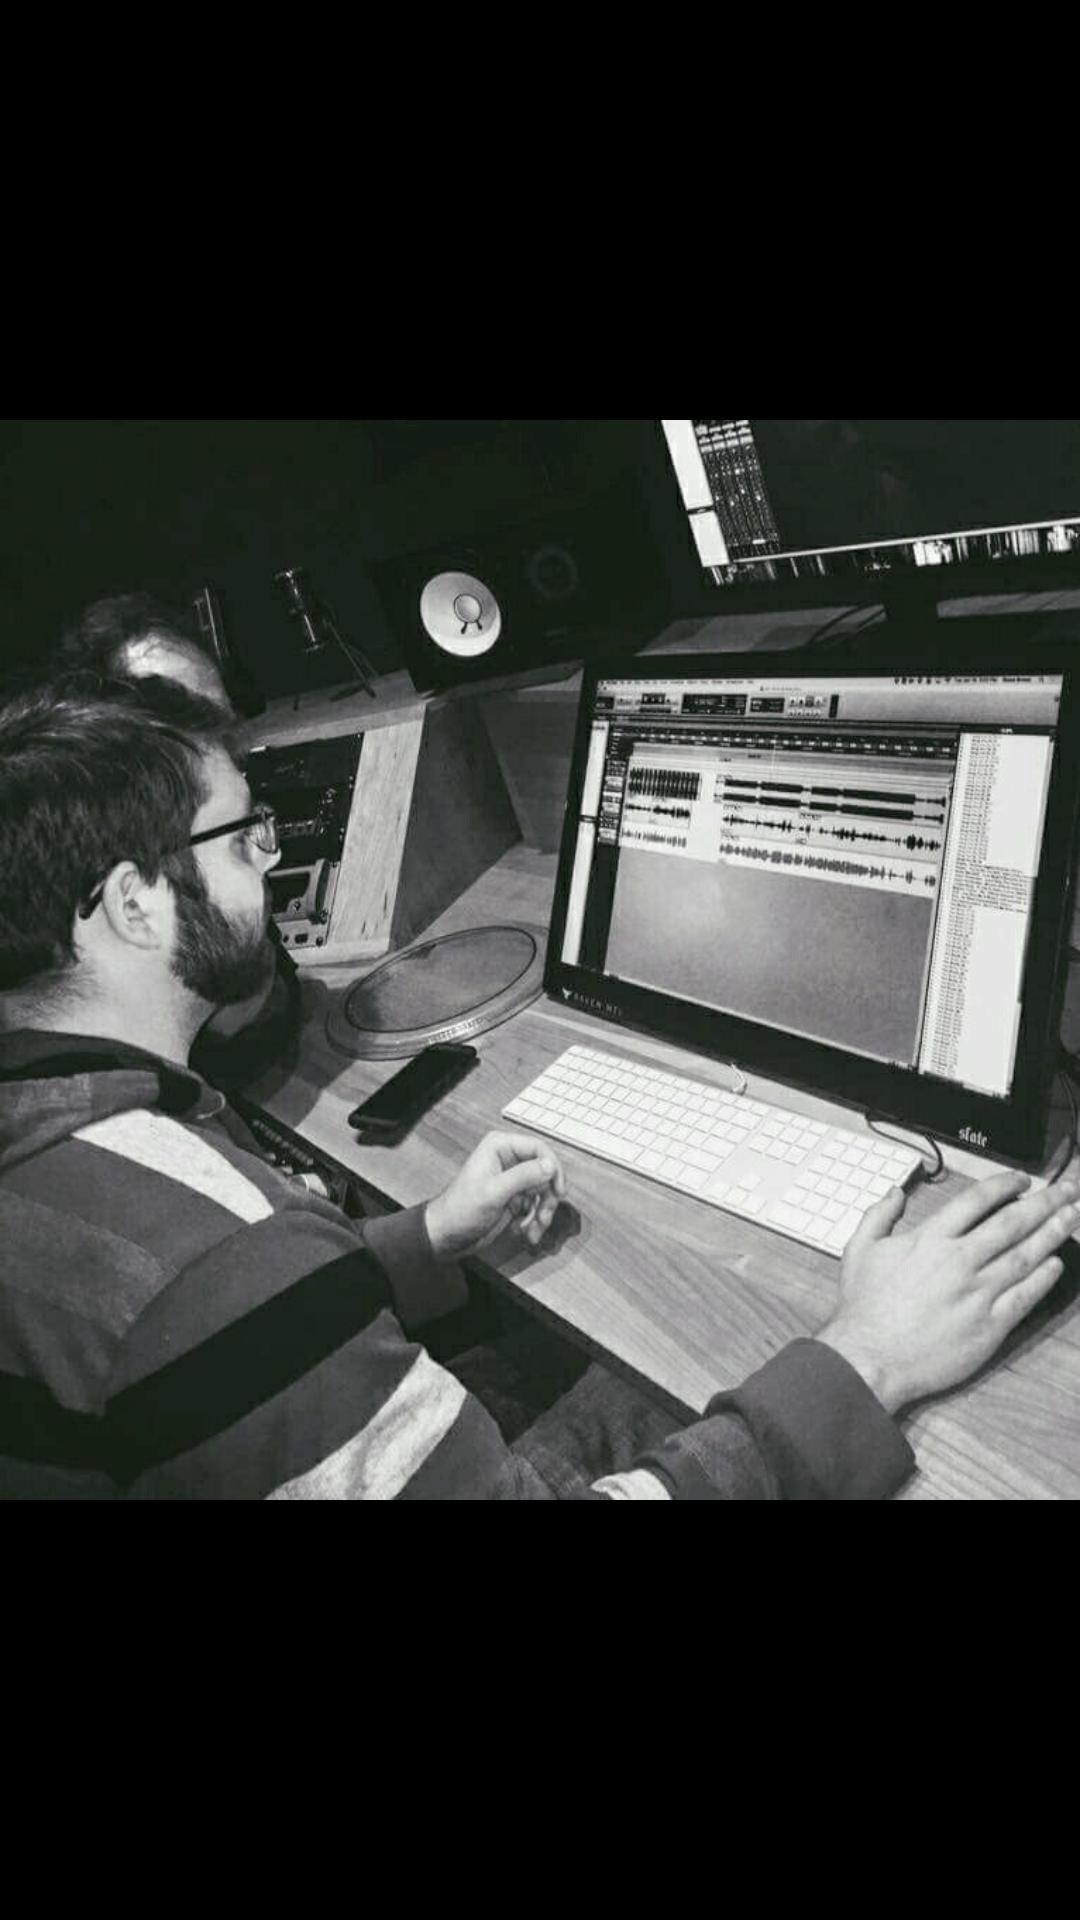 Austin Bates works in the studio.